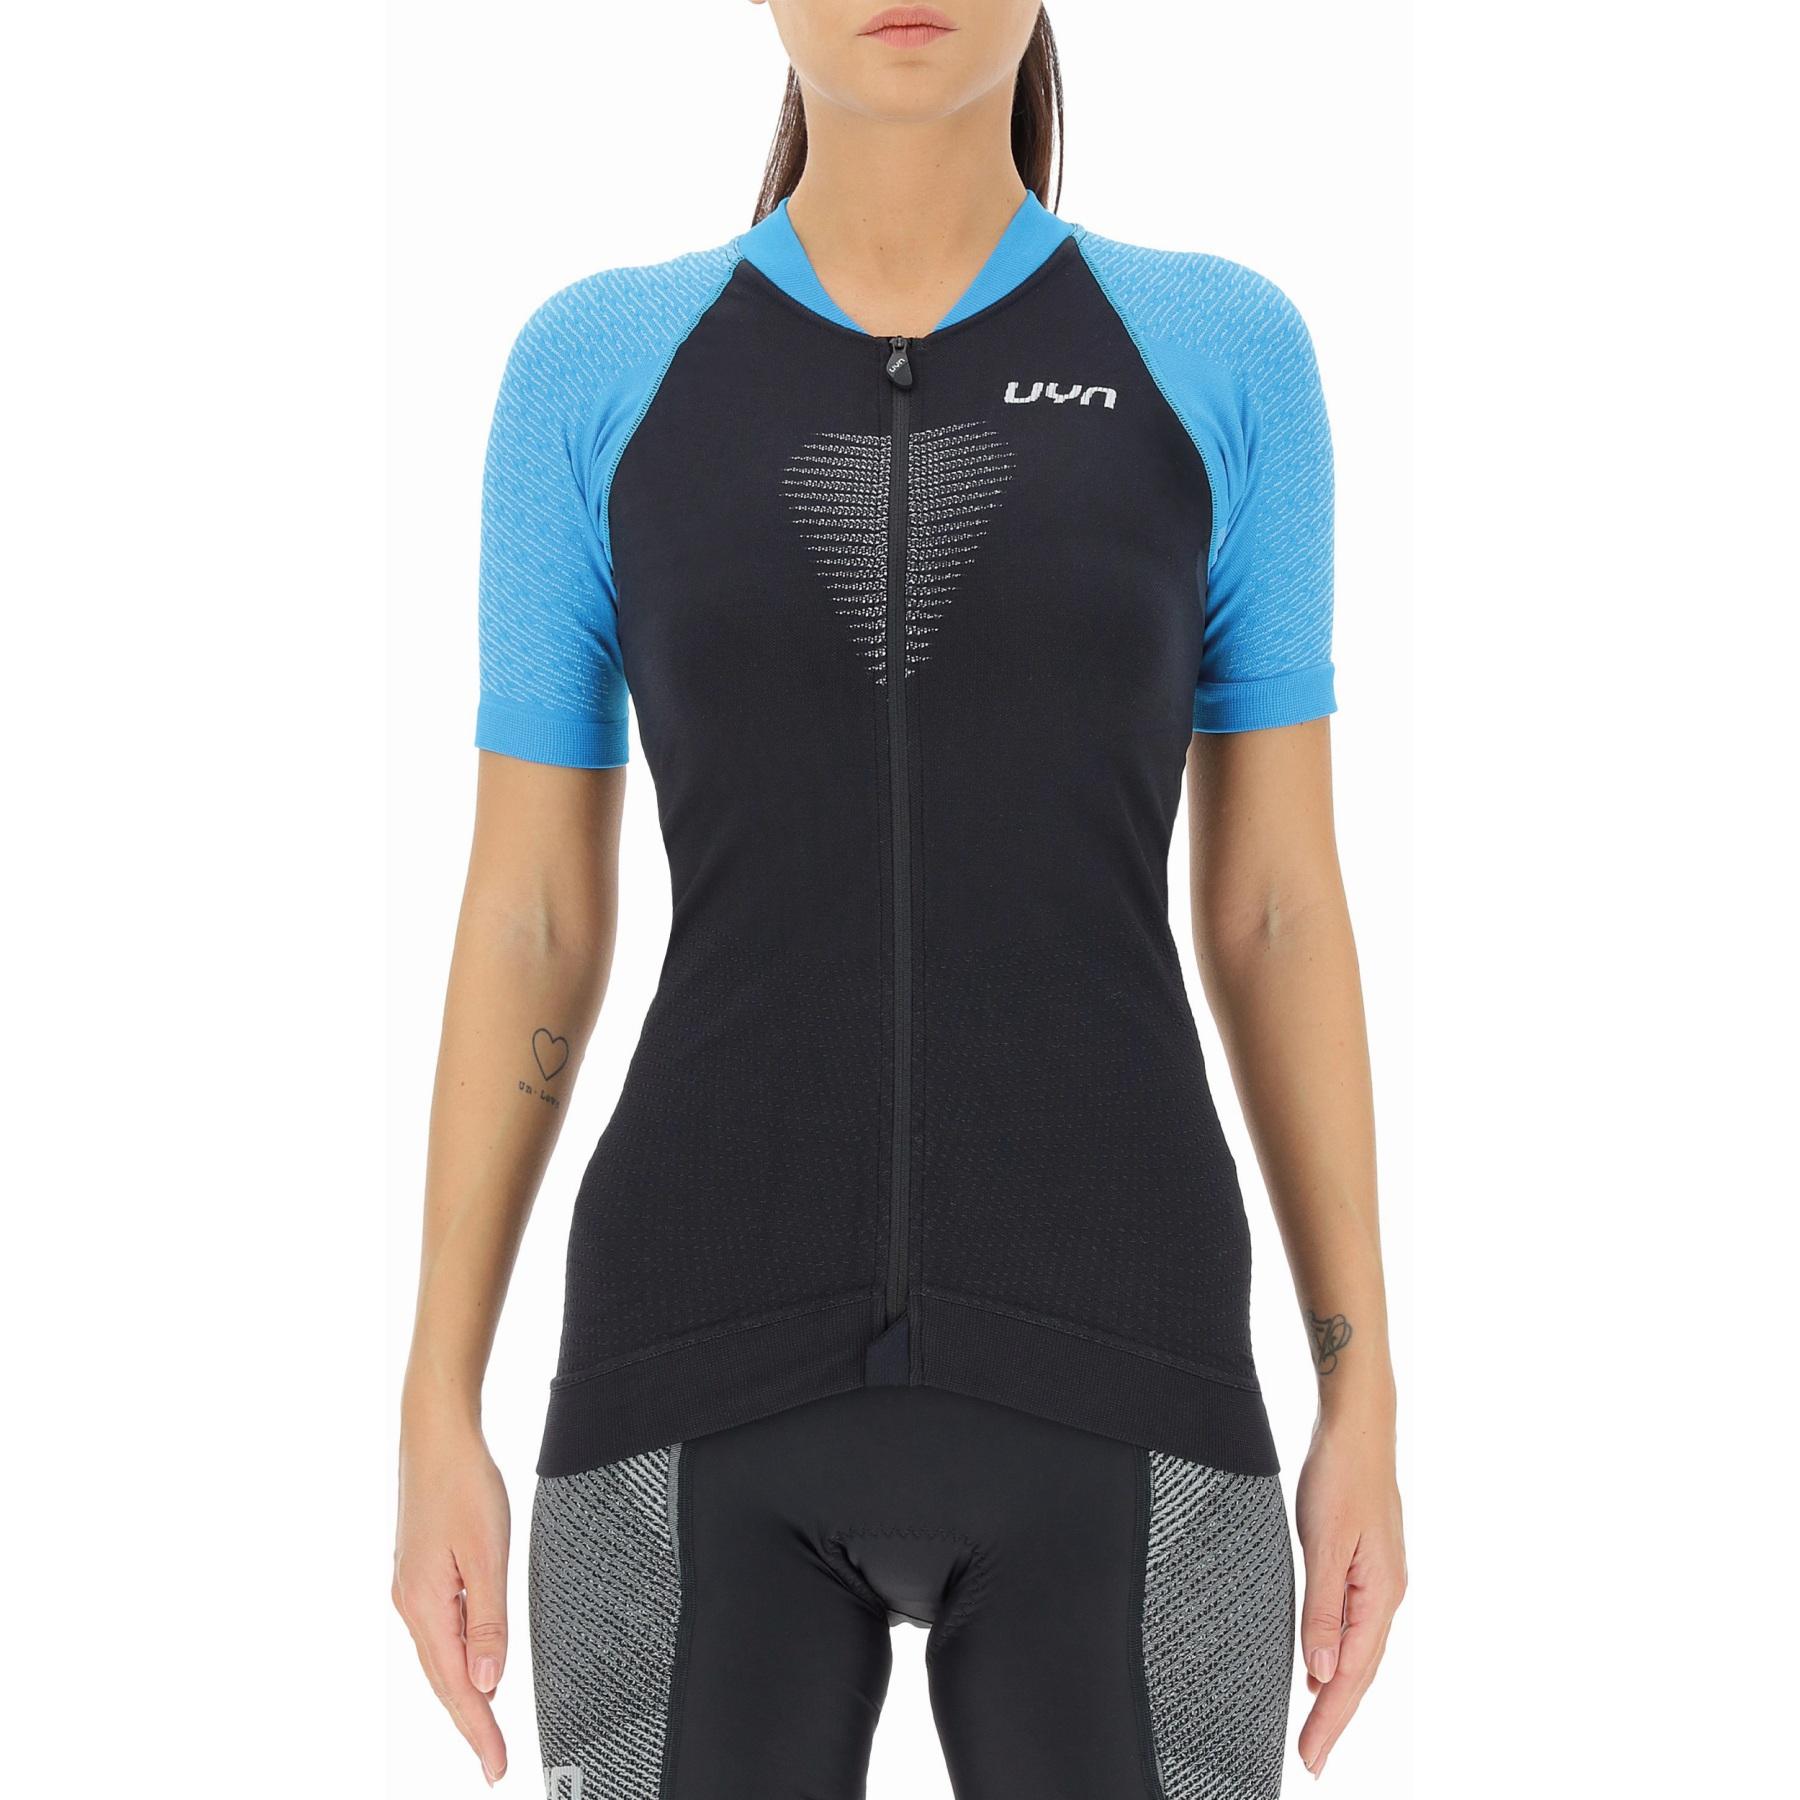 UYN Biking Granfondo T-Shirt Damen - Blackboard/Danube Blue